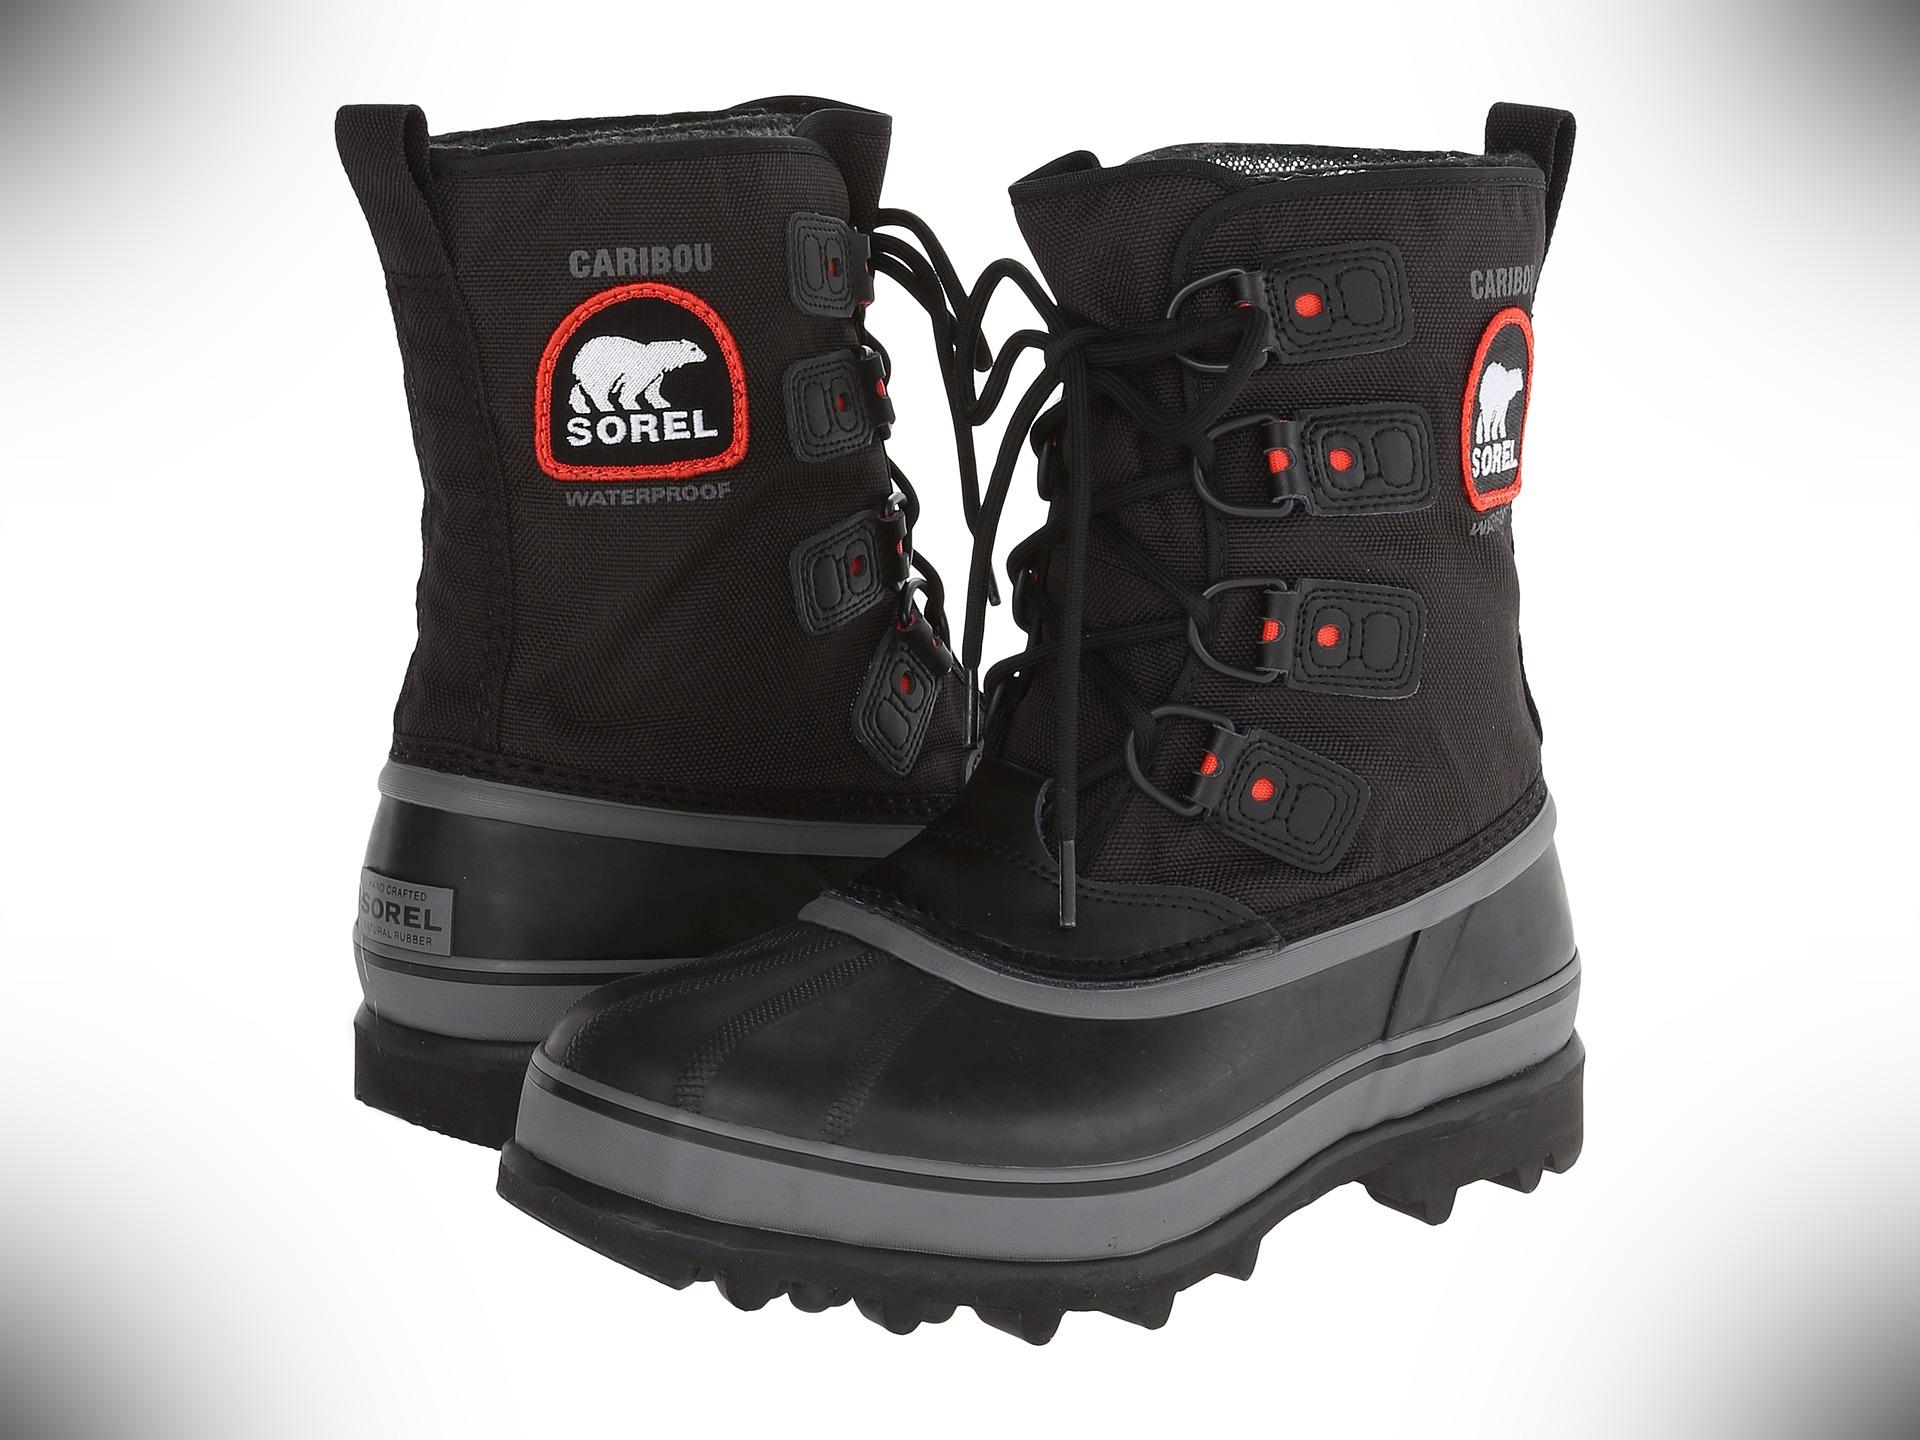 Sorel Caribou XT – waterproof boots for men